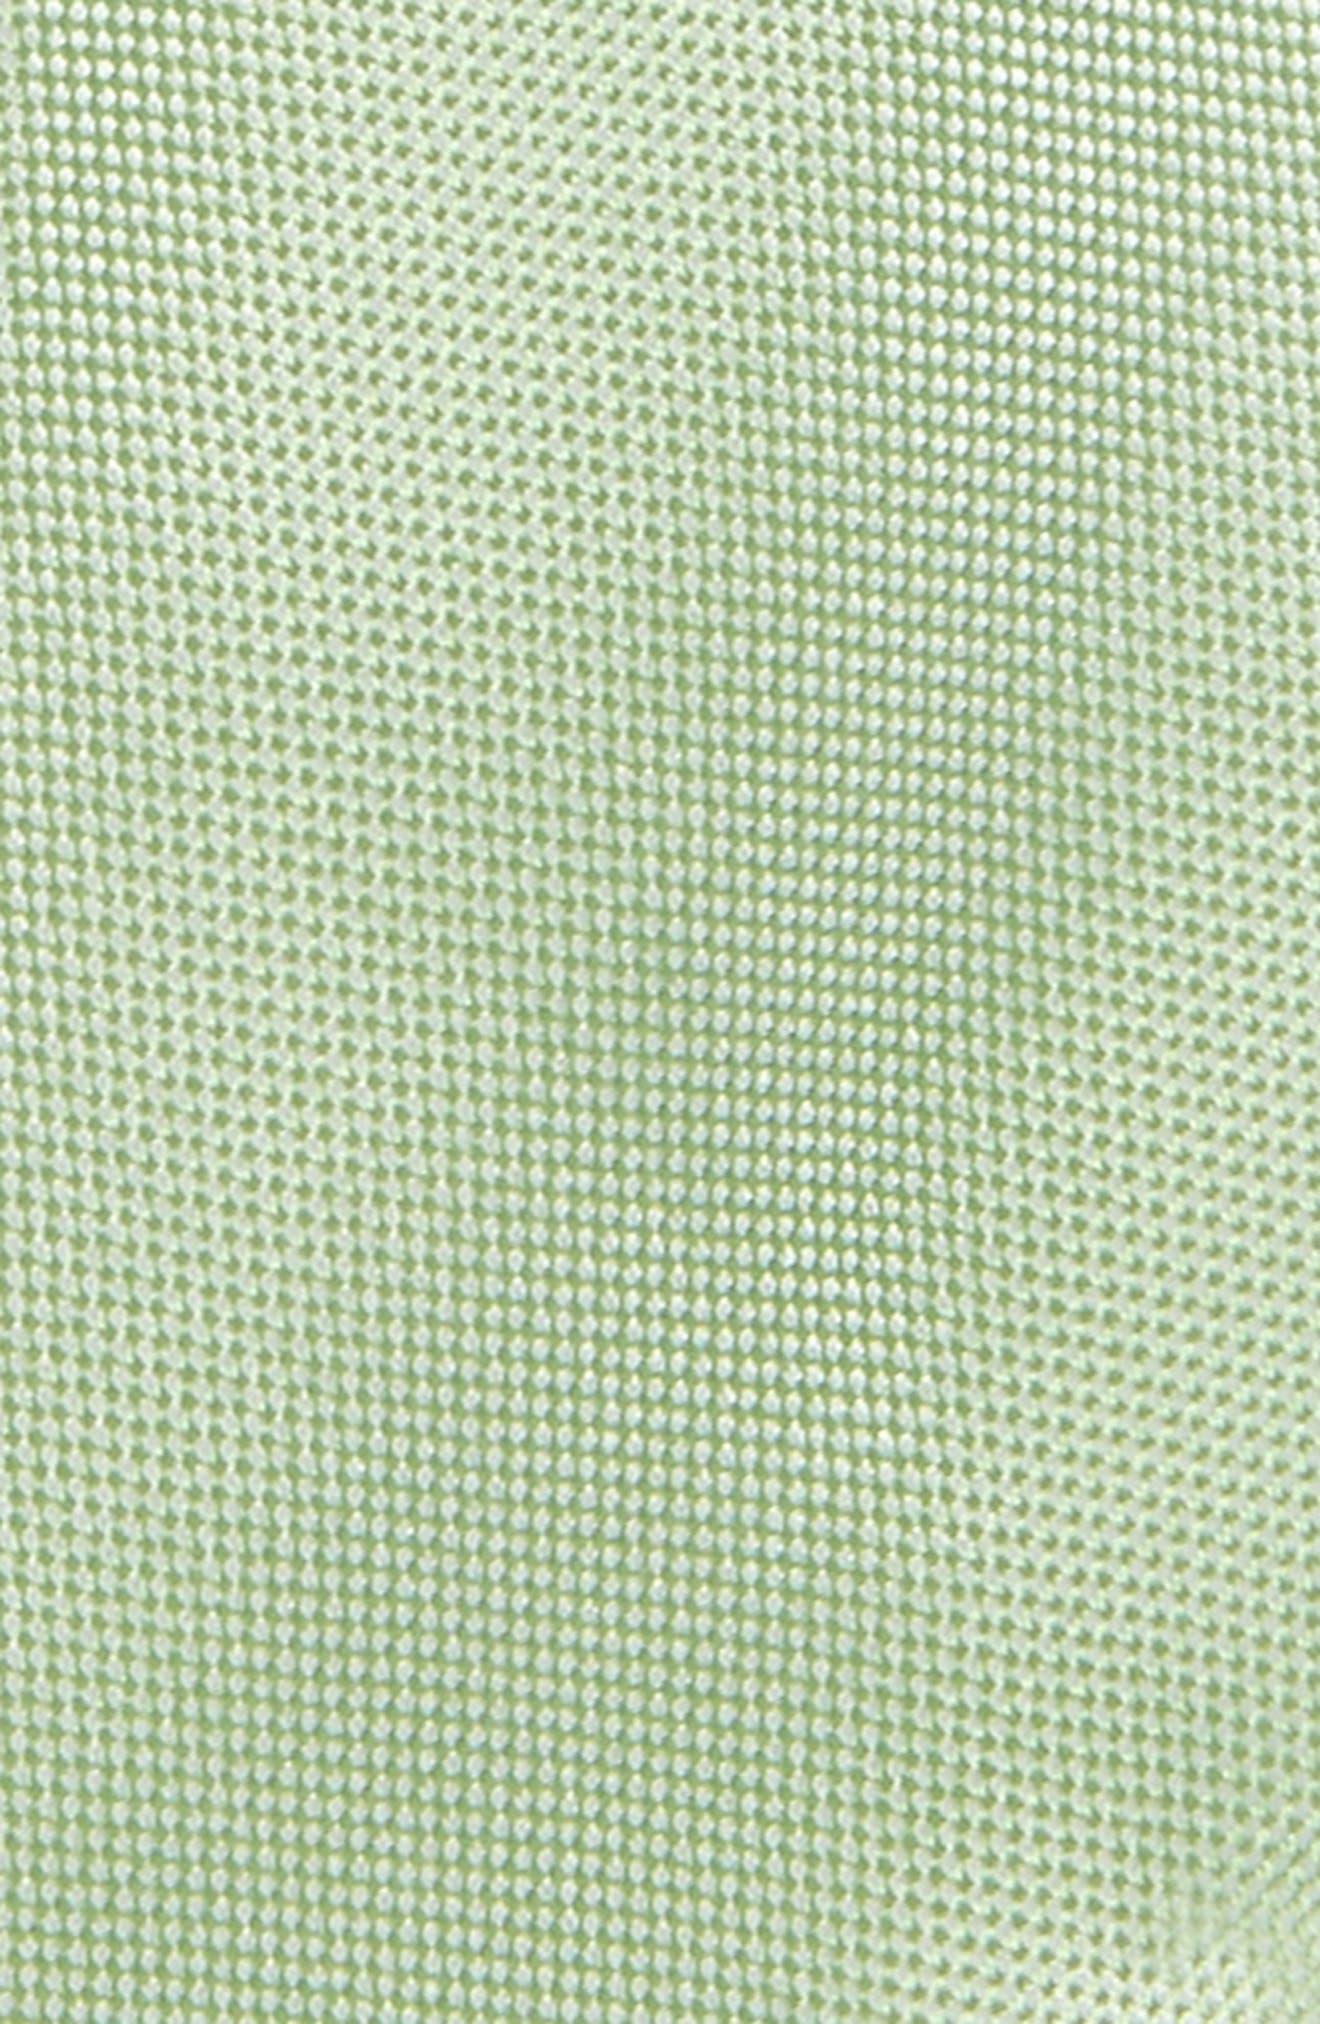 Natte Weave Silk Tie,                             Alternate thumbnail 2, color,                             300